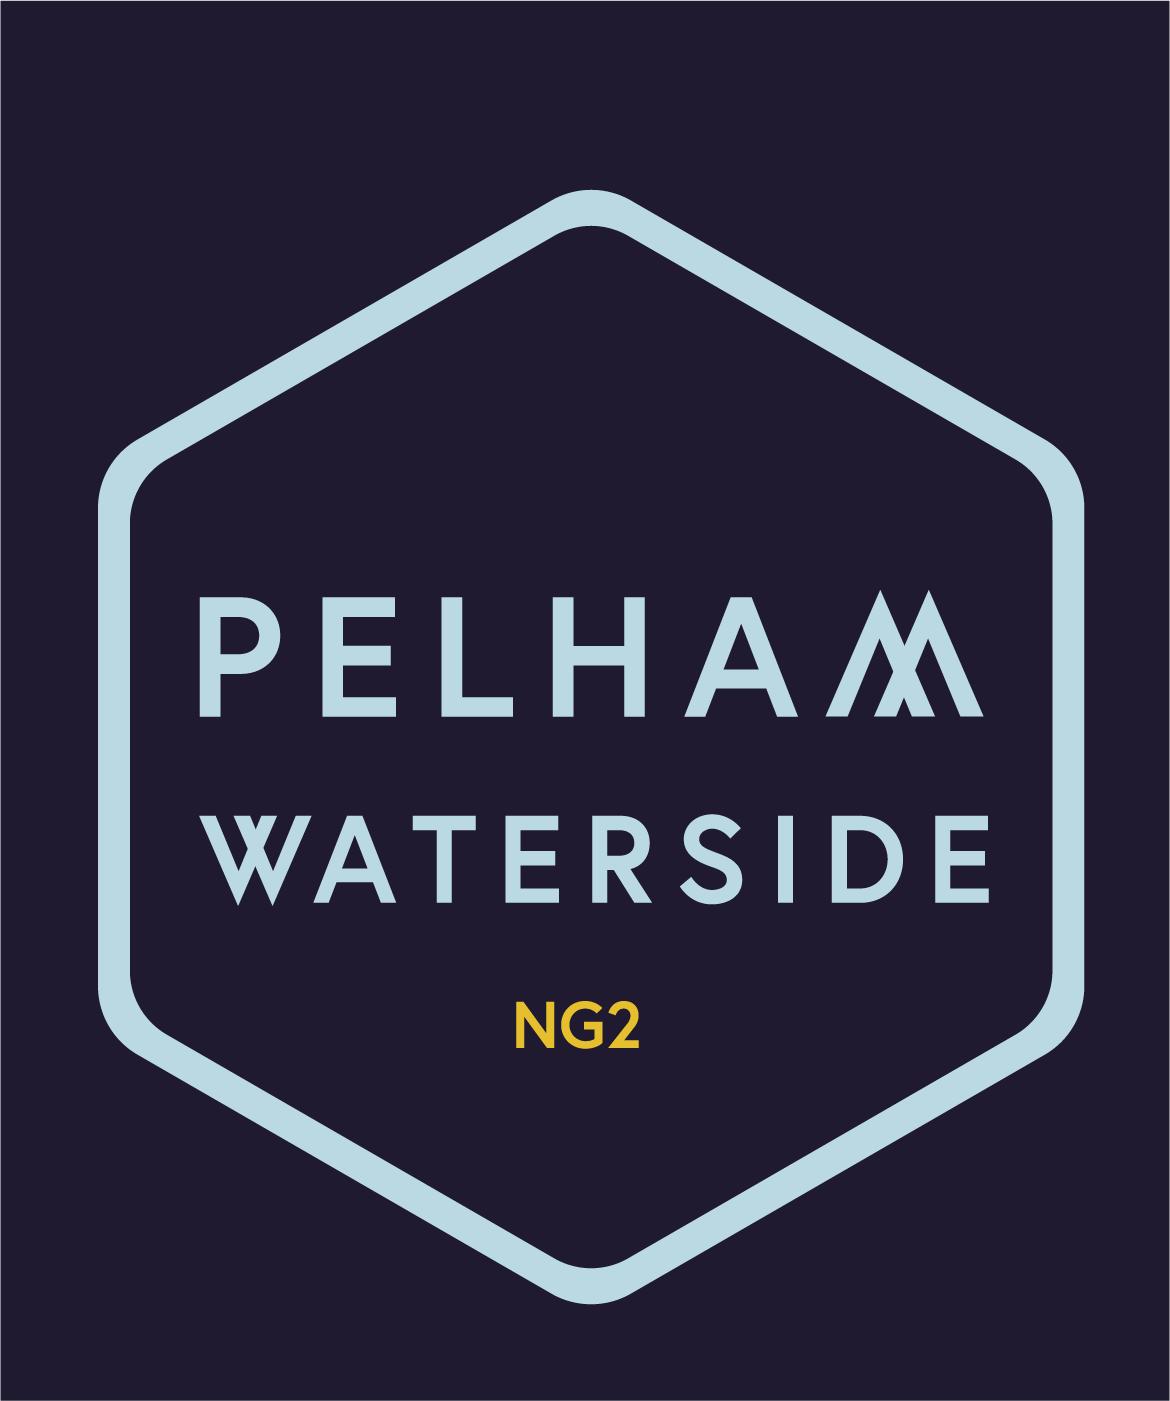 Pelham Waterside logo